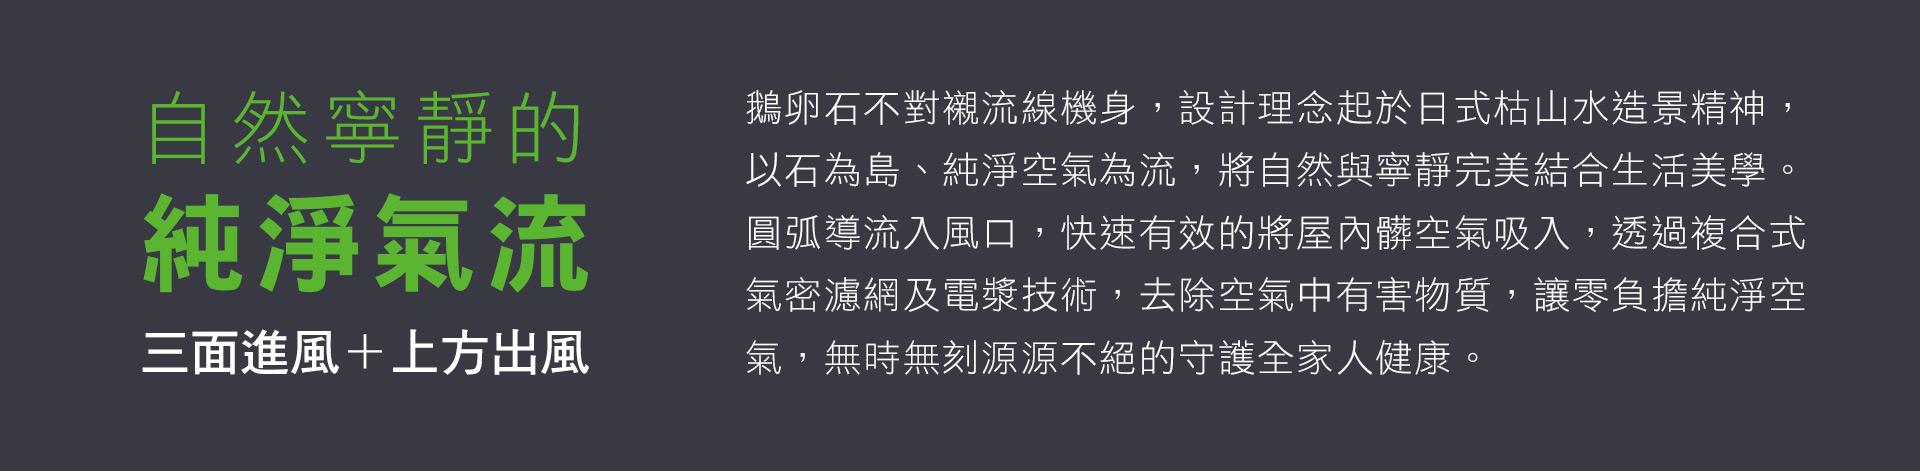 NEW週年慶LP_PC_20191112_v4_04